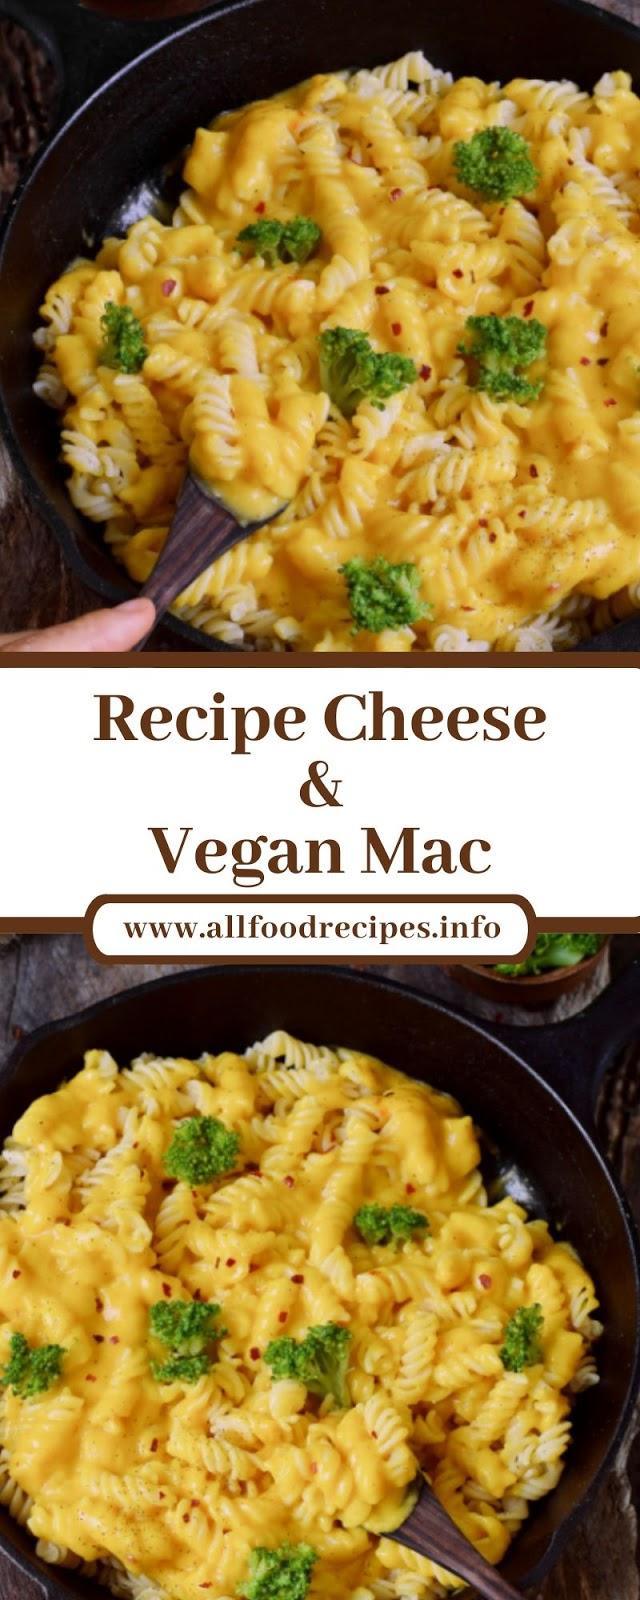 Recipe Cheese & Vegan Mac